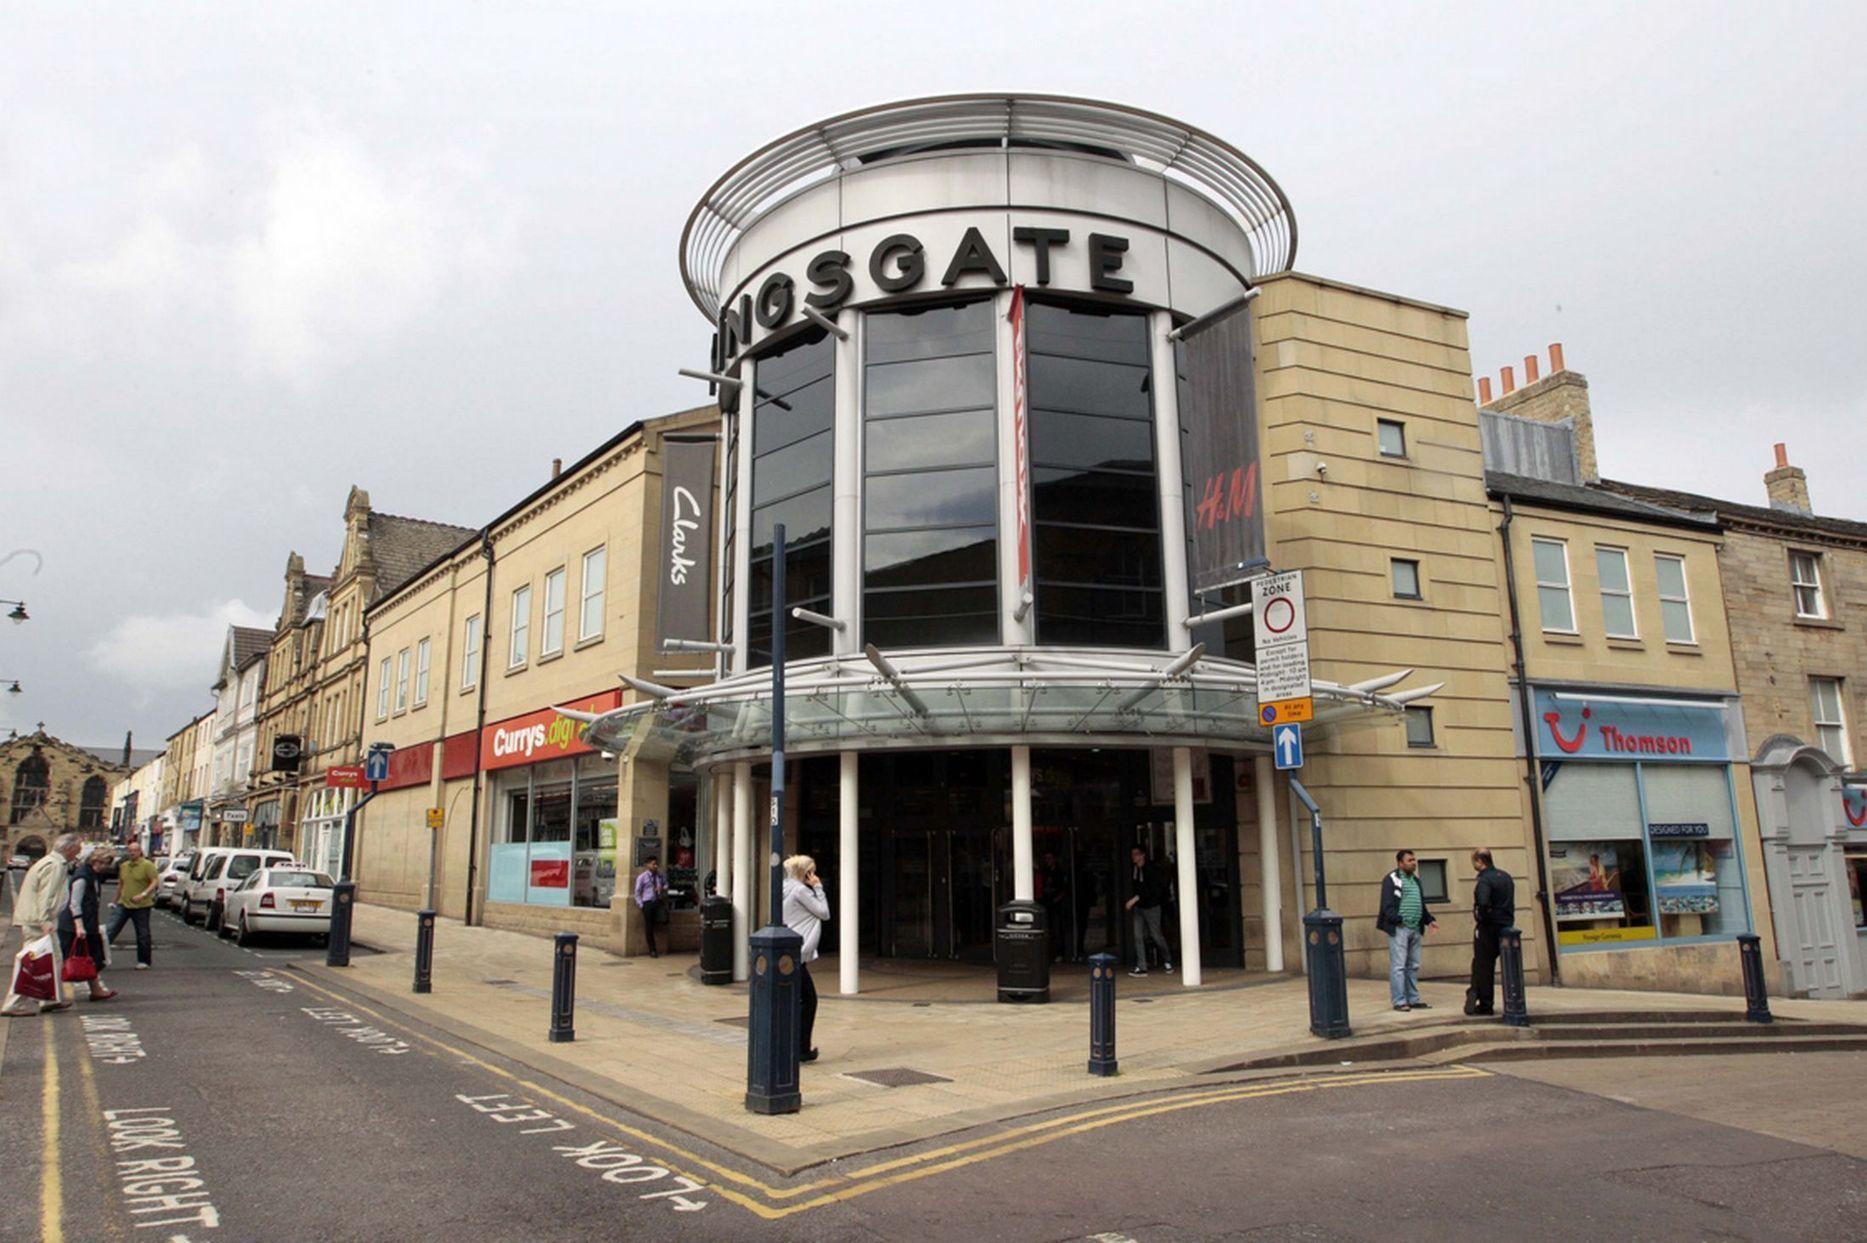 Huddersfield's Kingsgate Centre uses wi-fi conn...